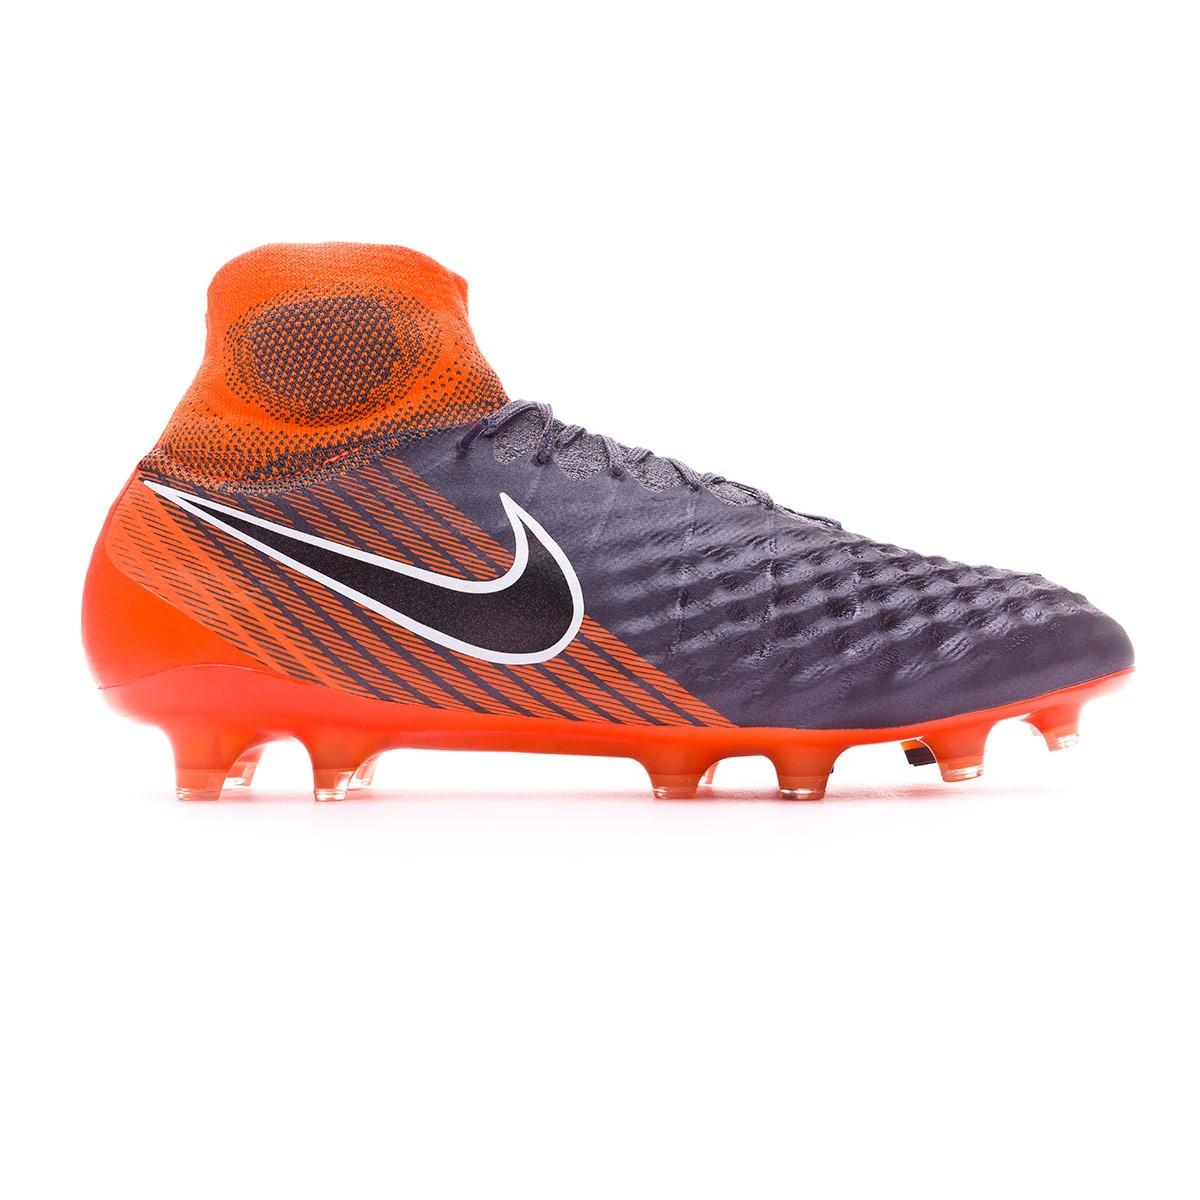 dfca26a505956 Football Boots Nike Magista Obra II Elite DF FG Dark grey-Black-Total orange -White - Tienda de fútbol Fútbol Emotion